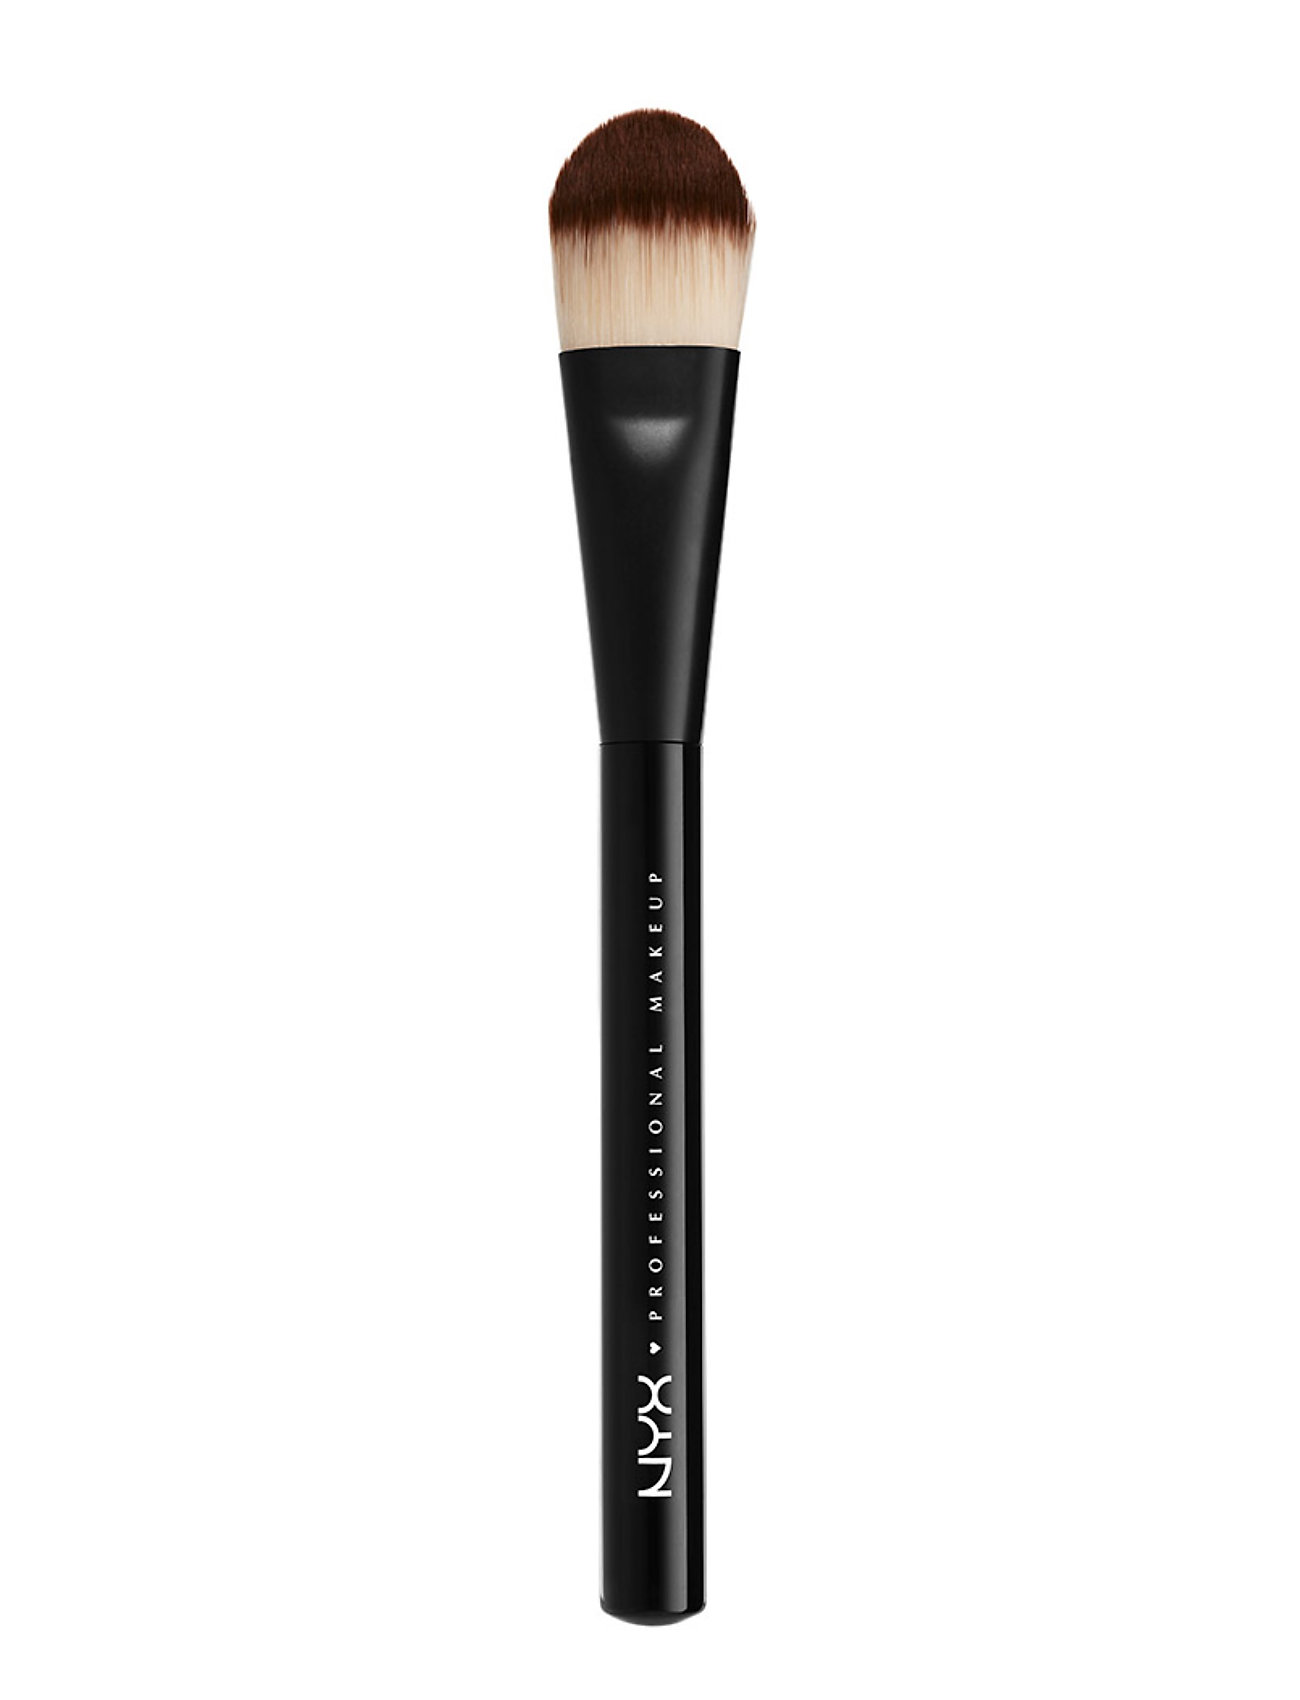 Image of Pro Flat Foundation Brush Beauty WOMEN Makeup Makeup Brushes Face Brushes Nude NYX PROFESSIONAL MAKEUP (3414619289)